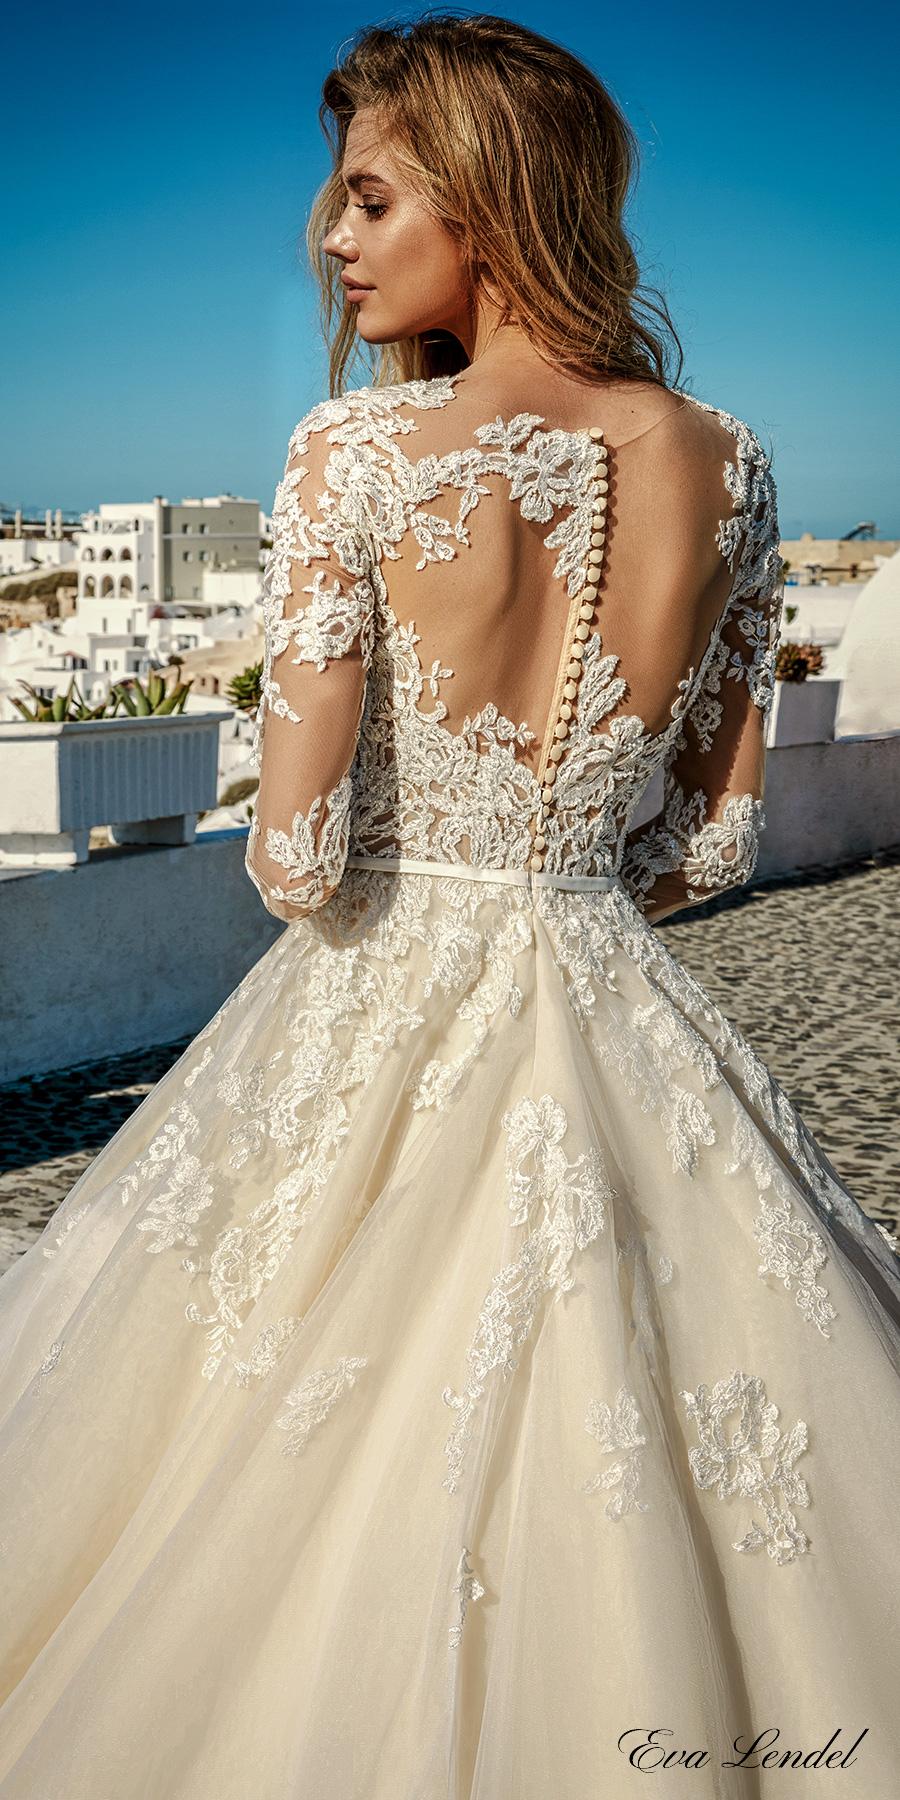 eva lendel 2017 bridal long sleeves v neck heavily embellished bodice romantic princess ivory a line wedding dress illusion lace back chapel train (allen) zbv